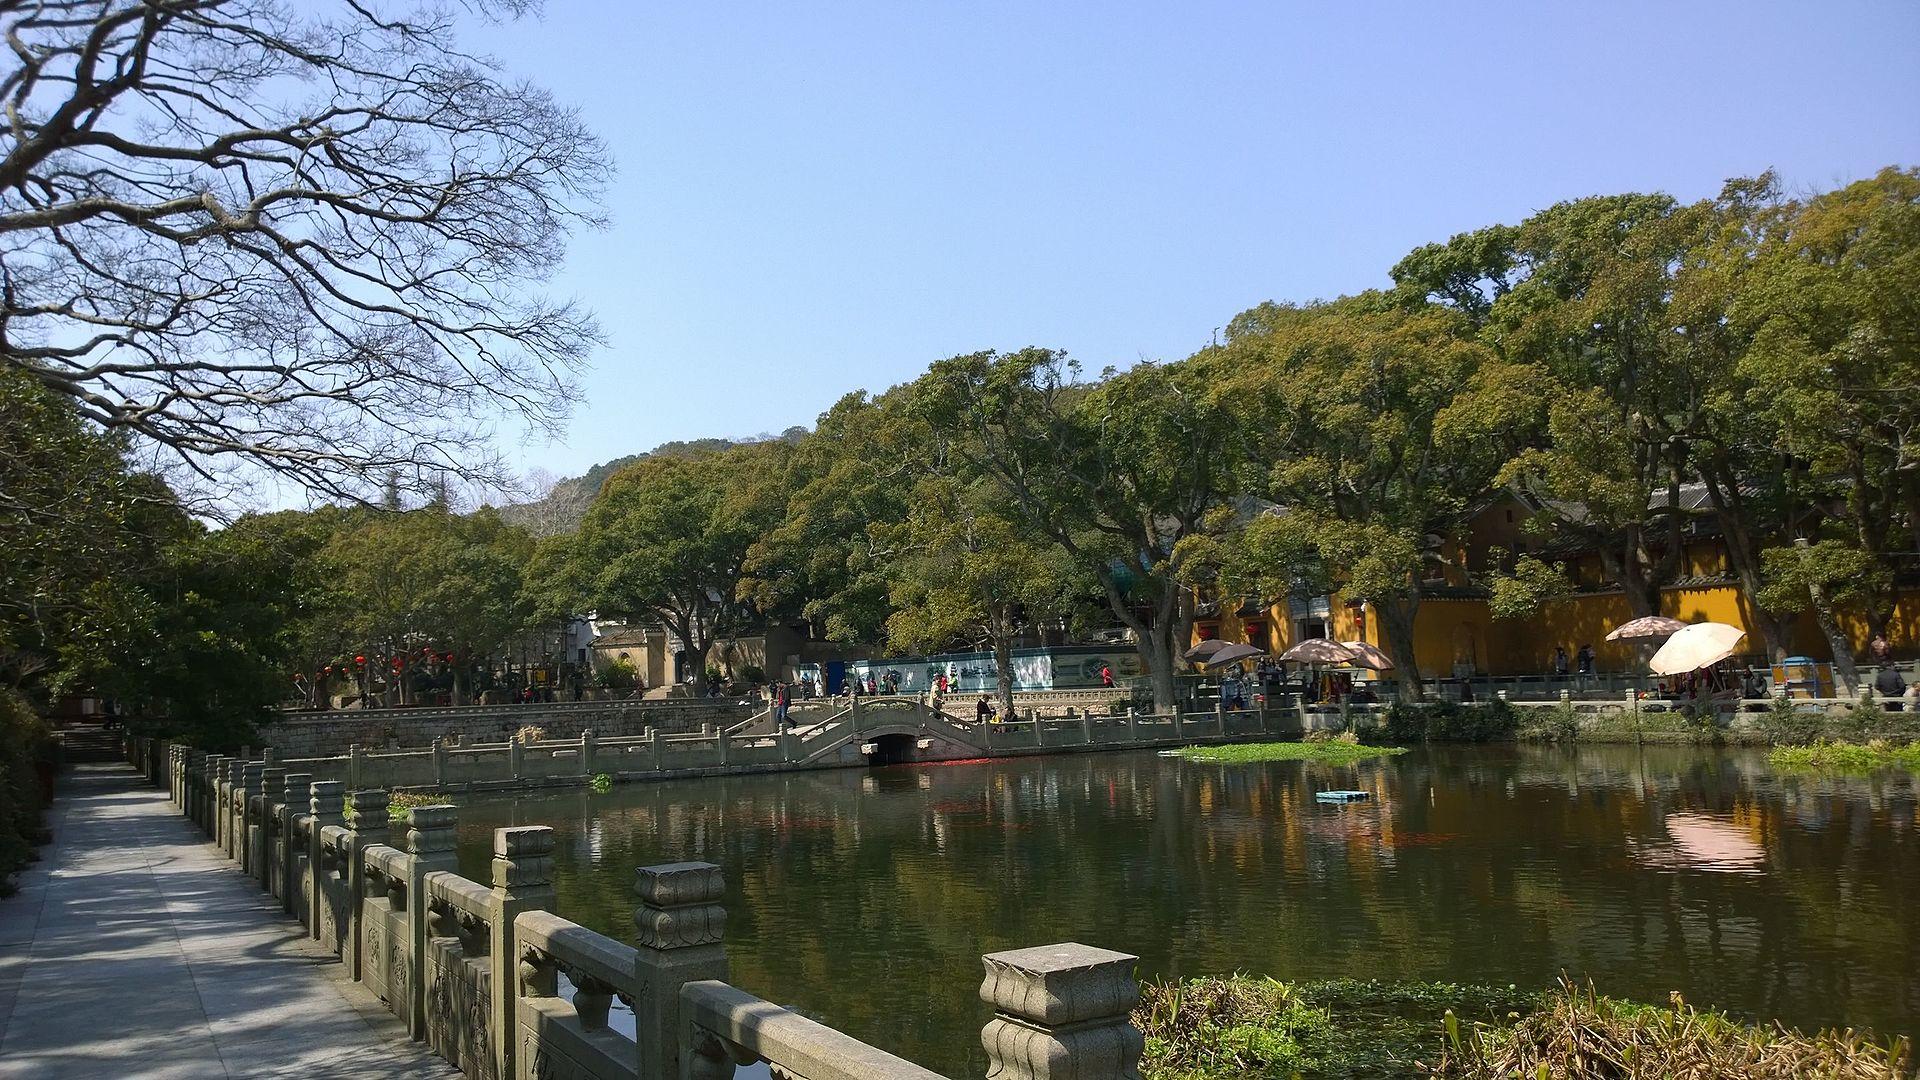 Lake_at_Puji_Temple_3.jpg